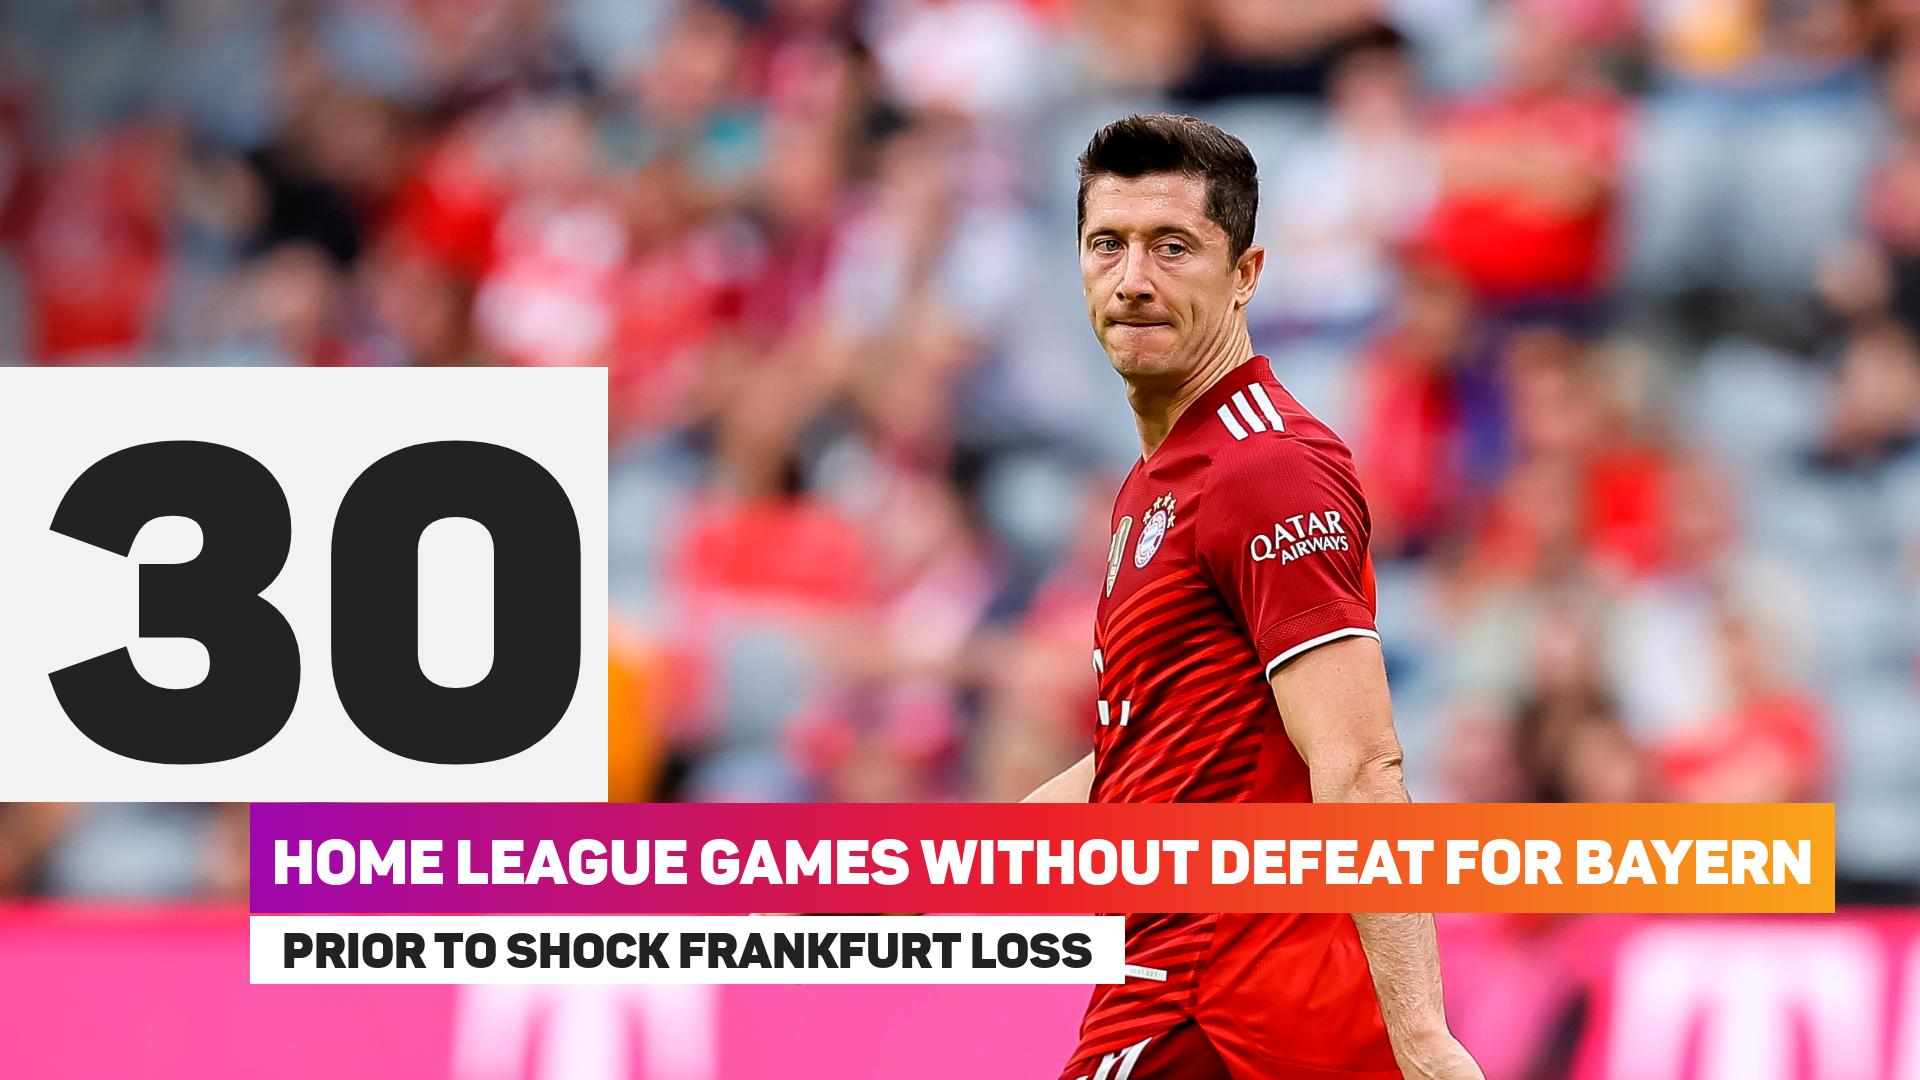 Bayern suffered a rare home loss against Frankfurt